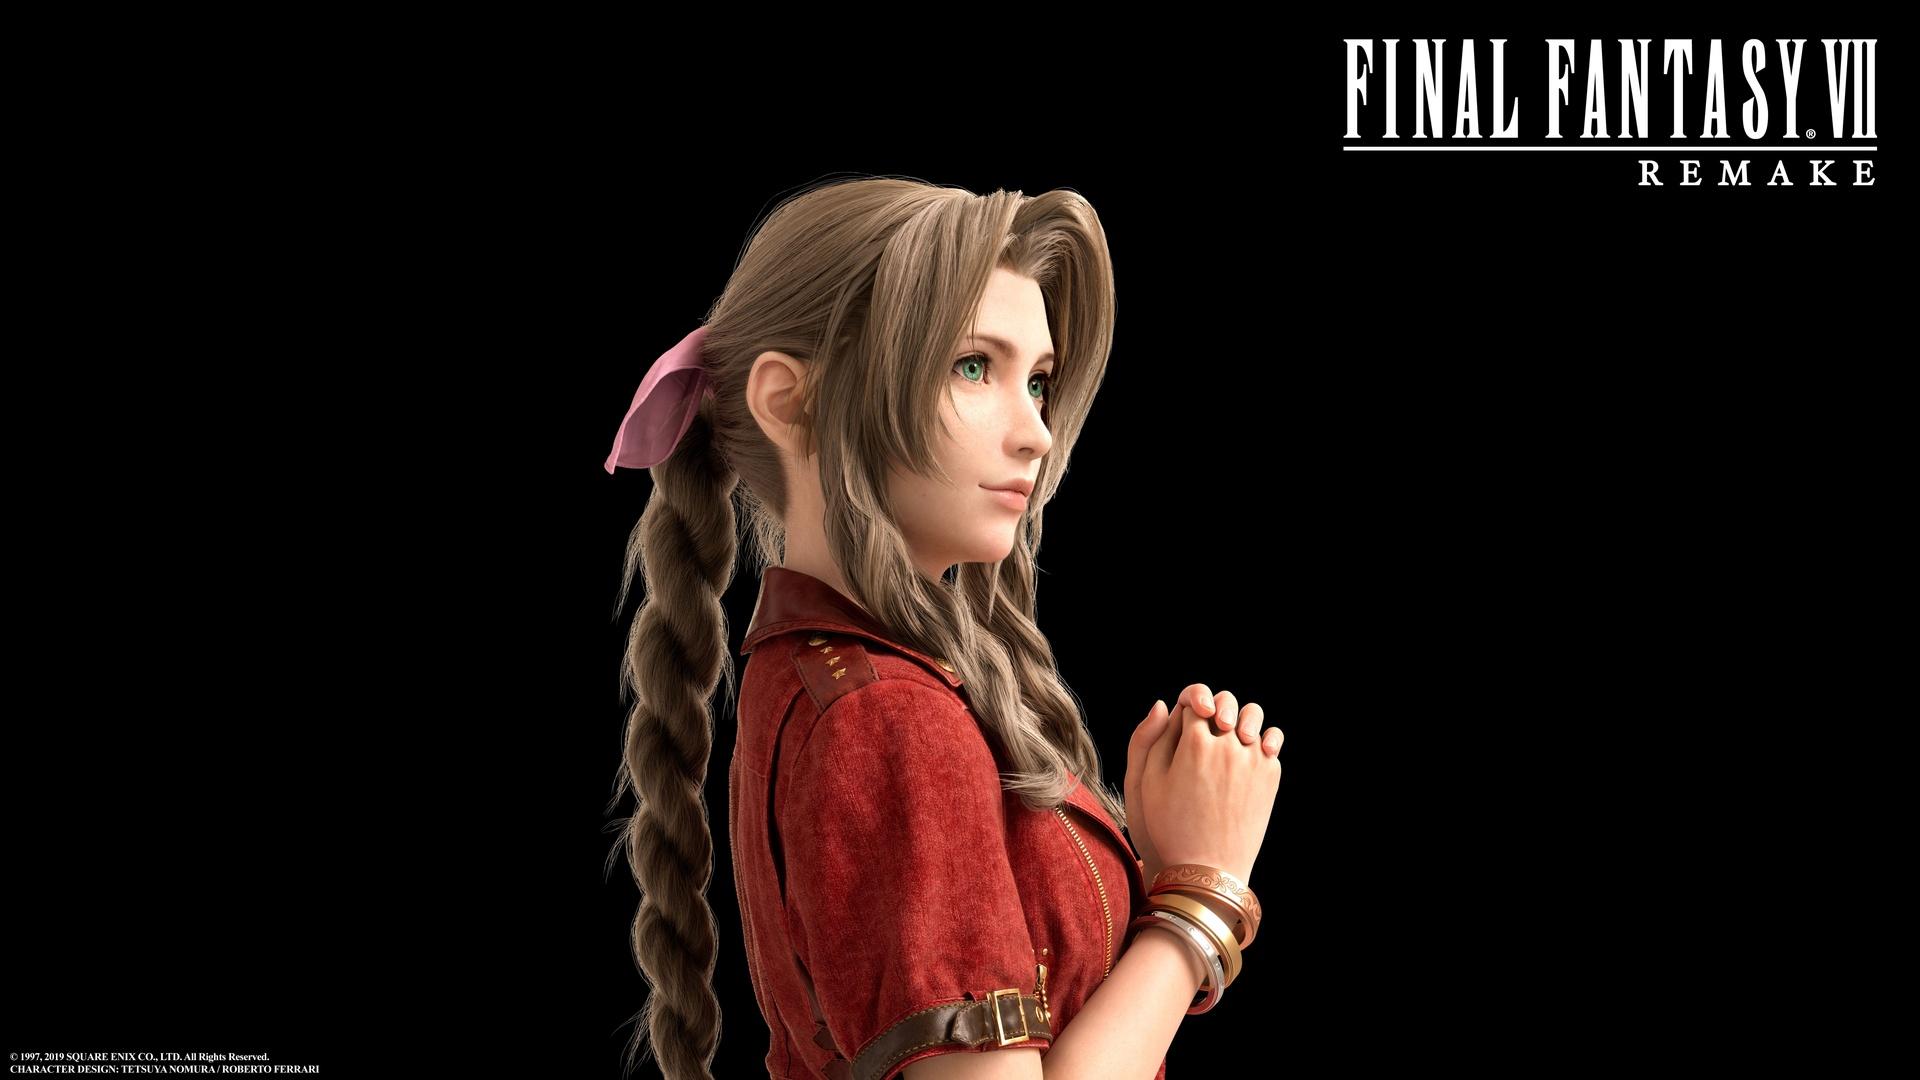 Aerith, Final Fantasy VII Remake